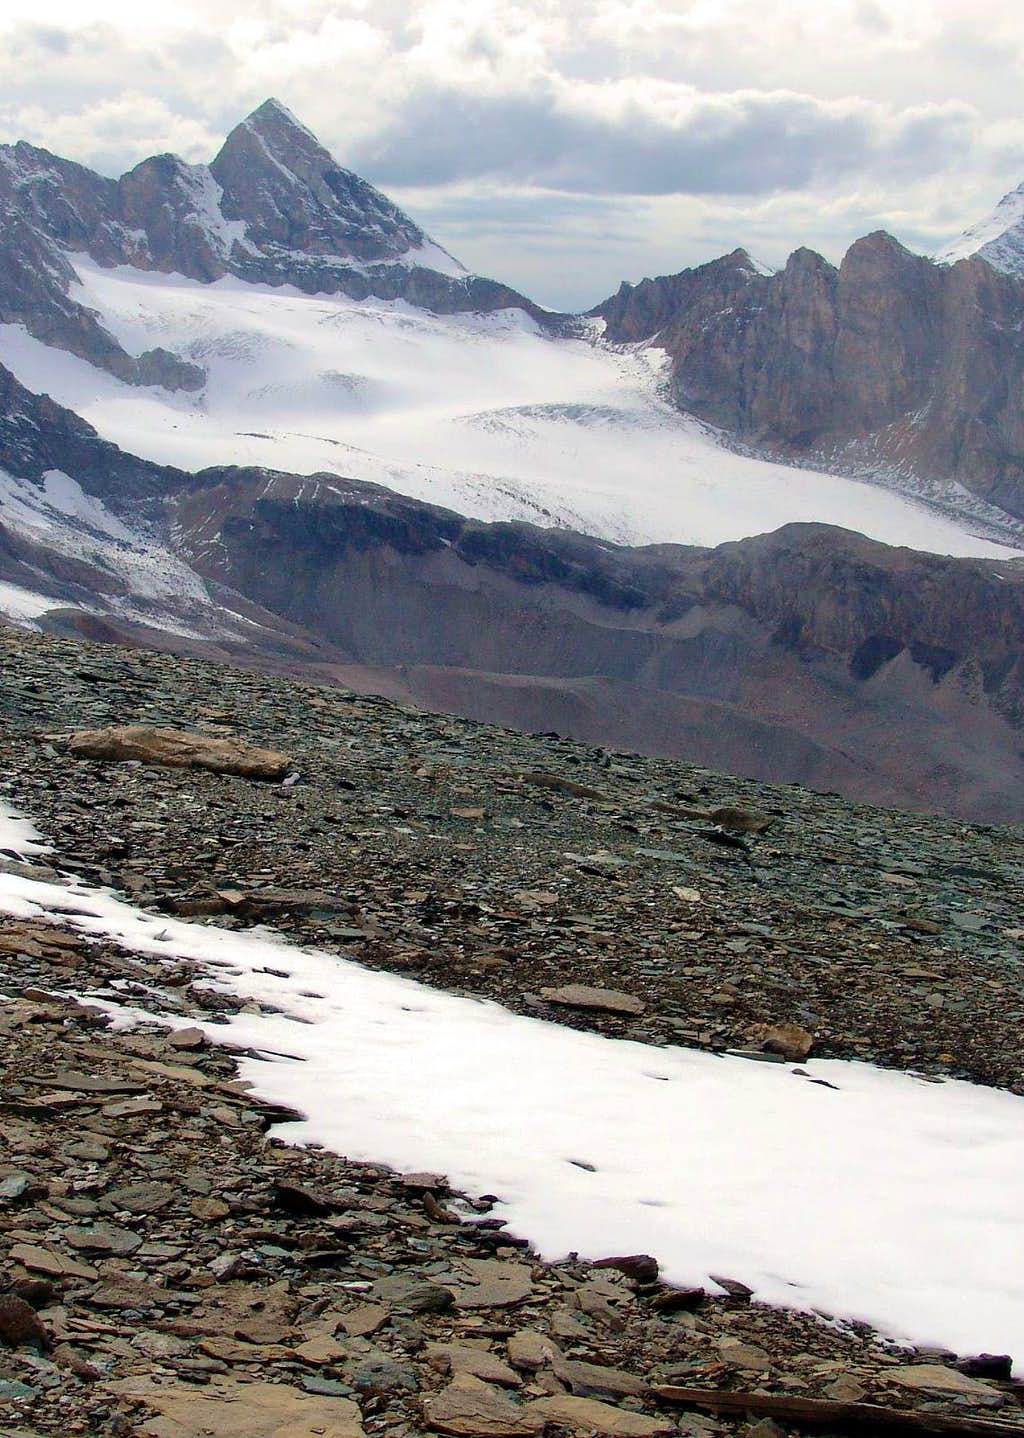 Soches - Tsanteleina Glacier